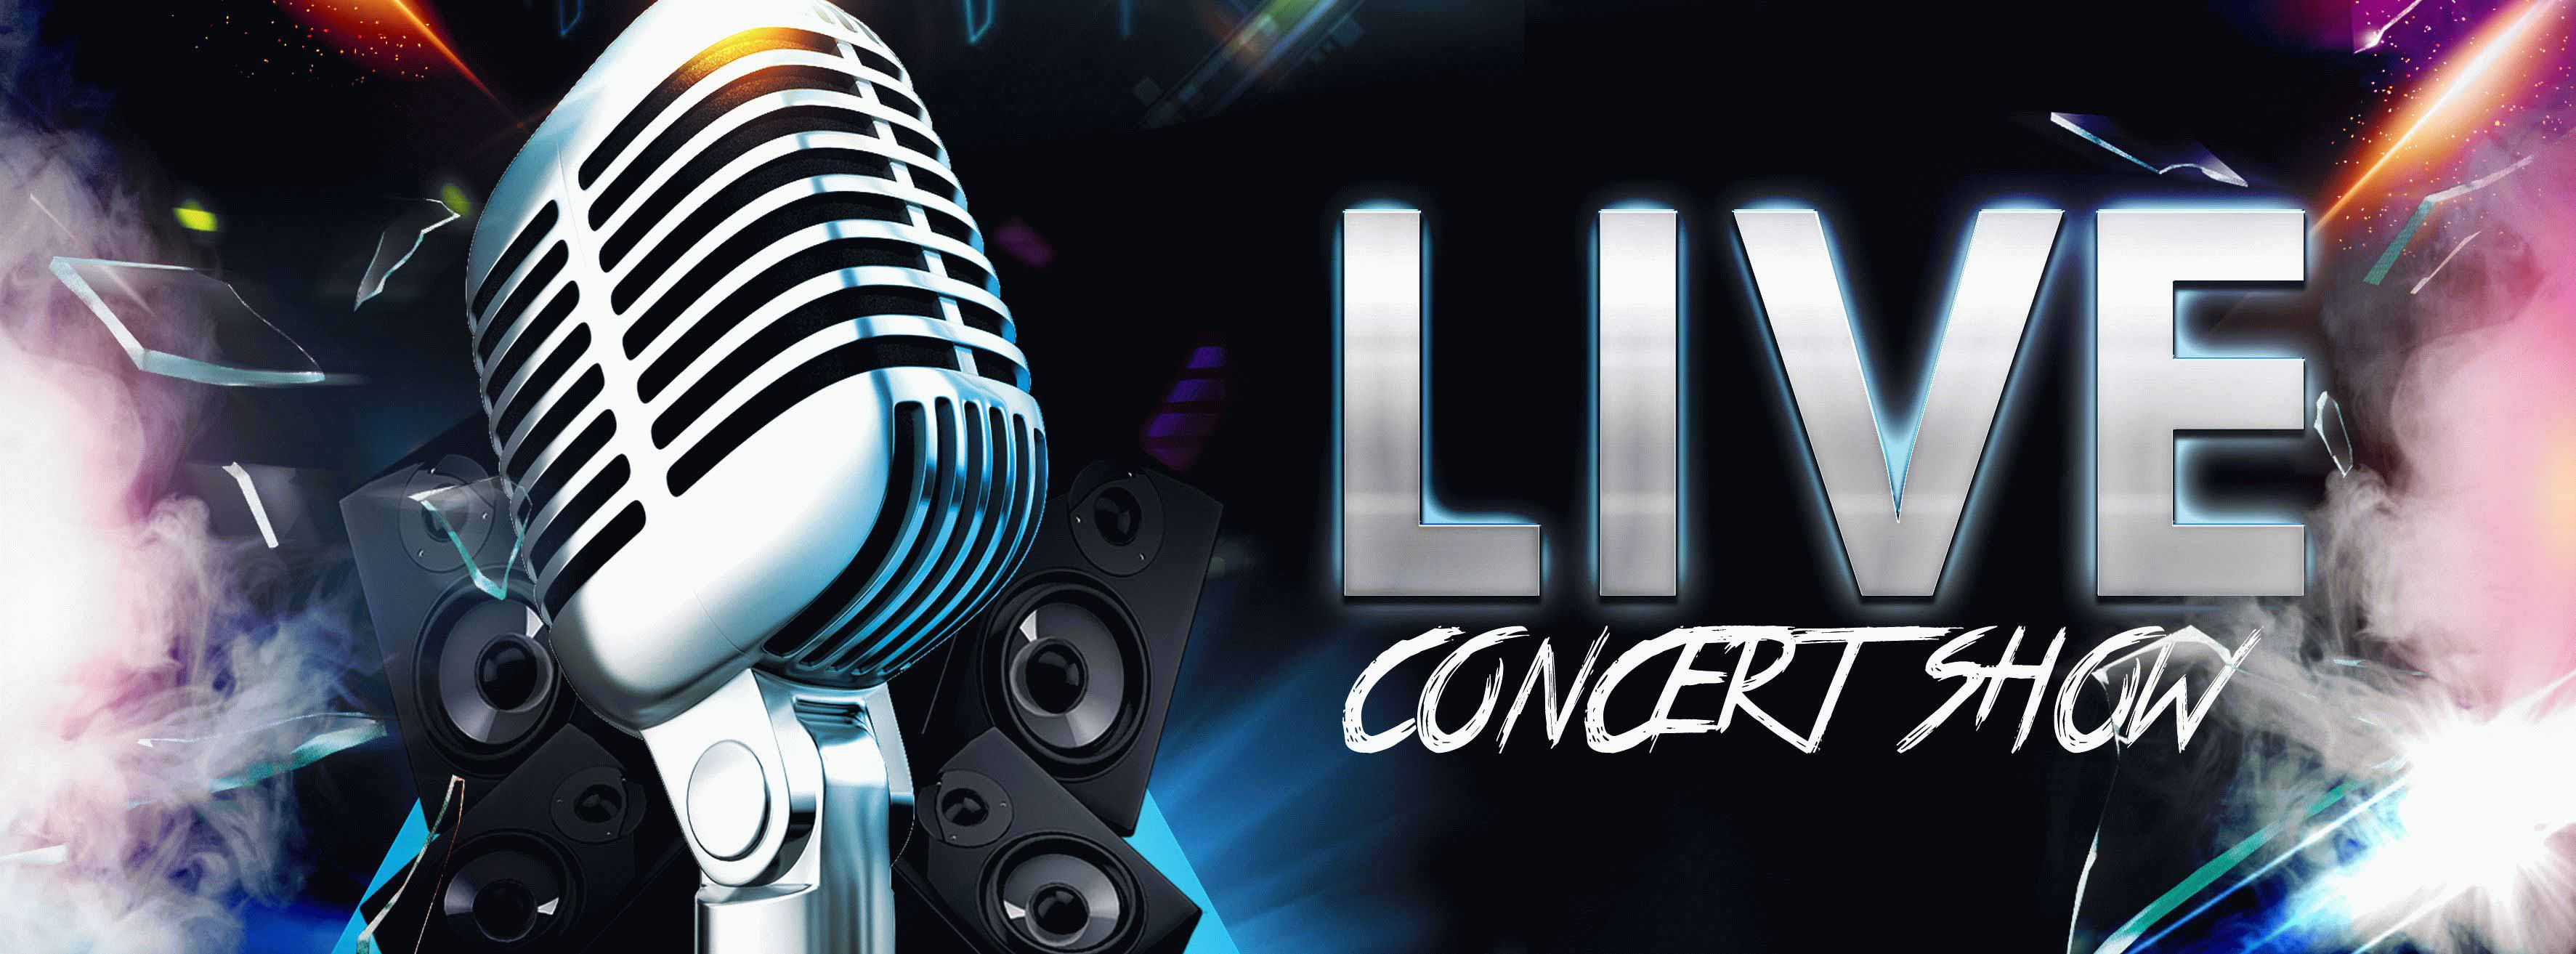 Live Concert Show PSD Flyer Template